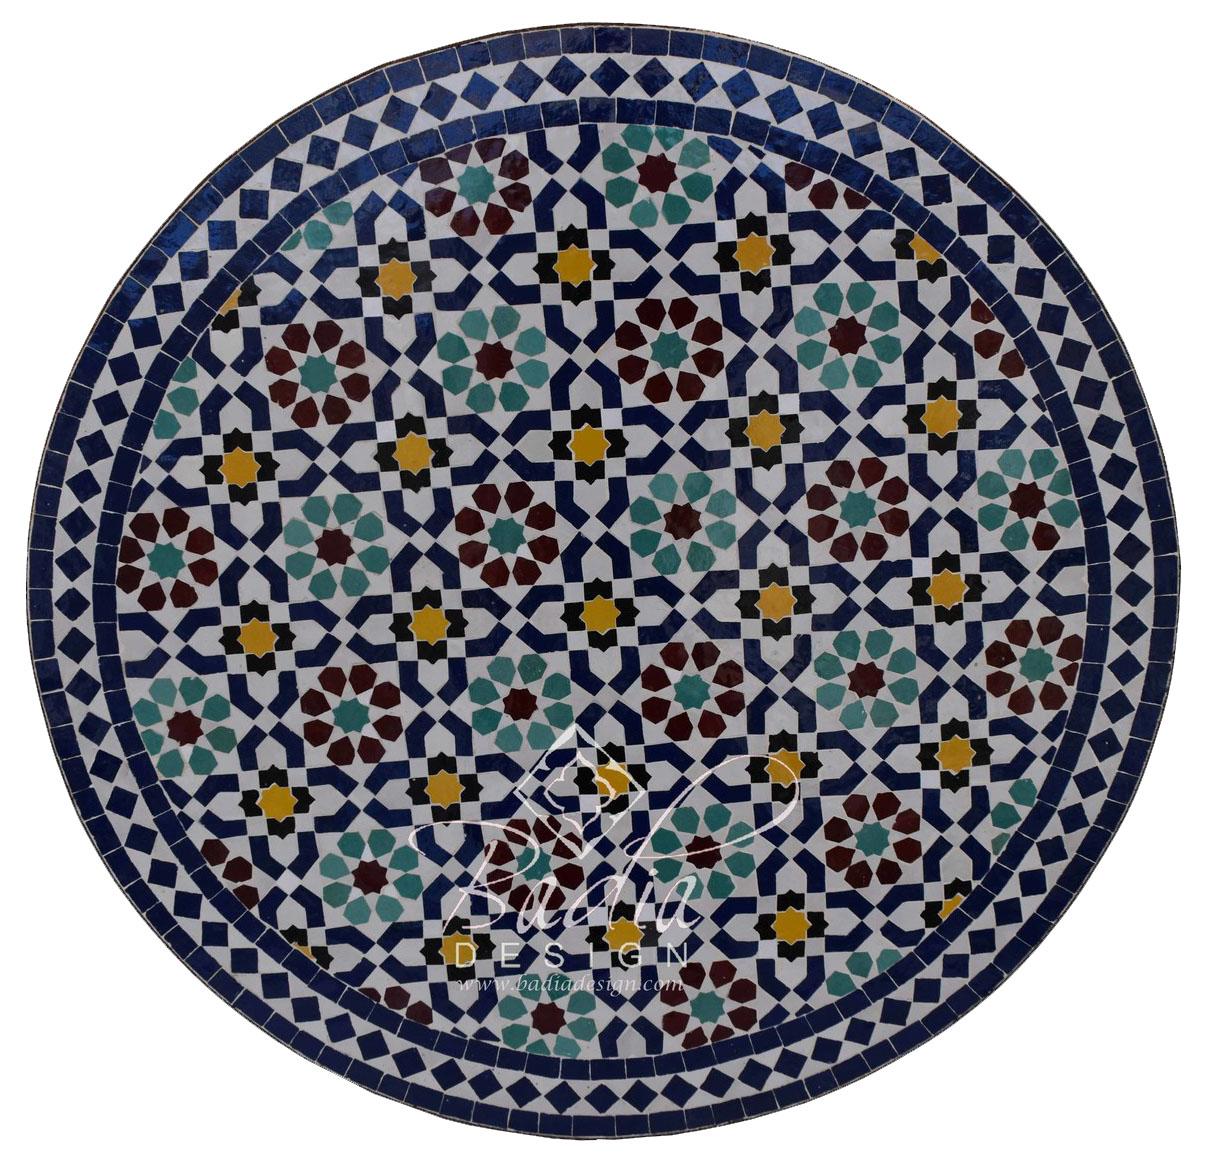 moroccan-mosaic-tile-table-top-mtr271a.jpg